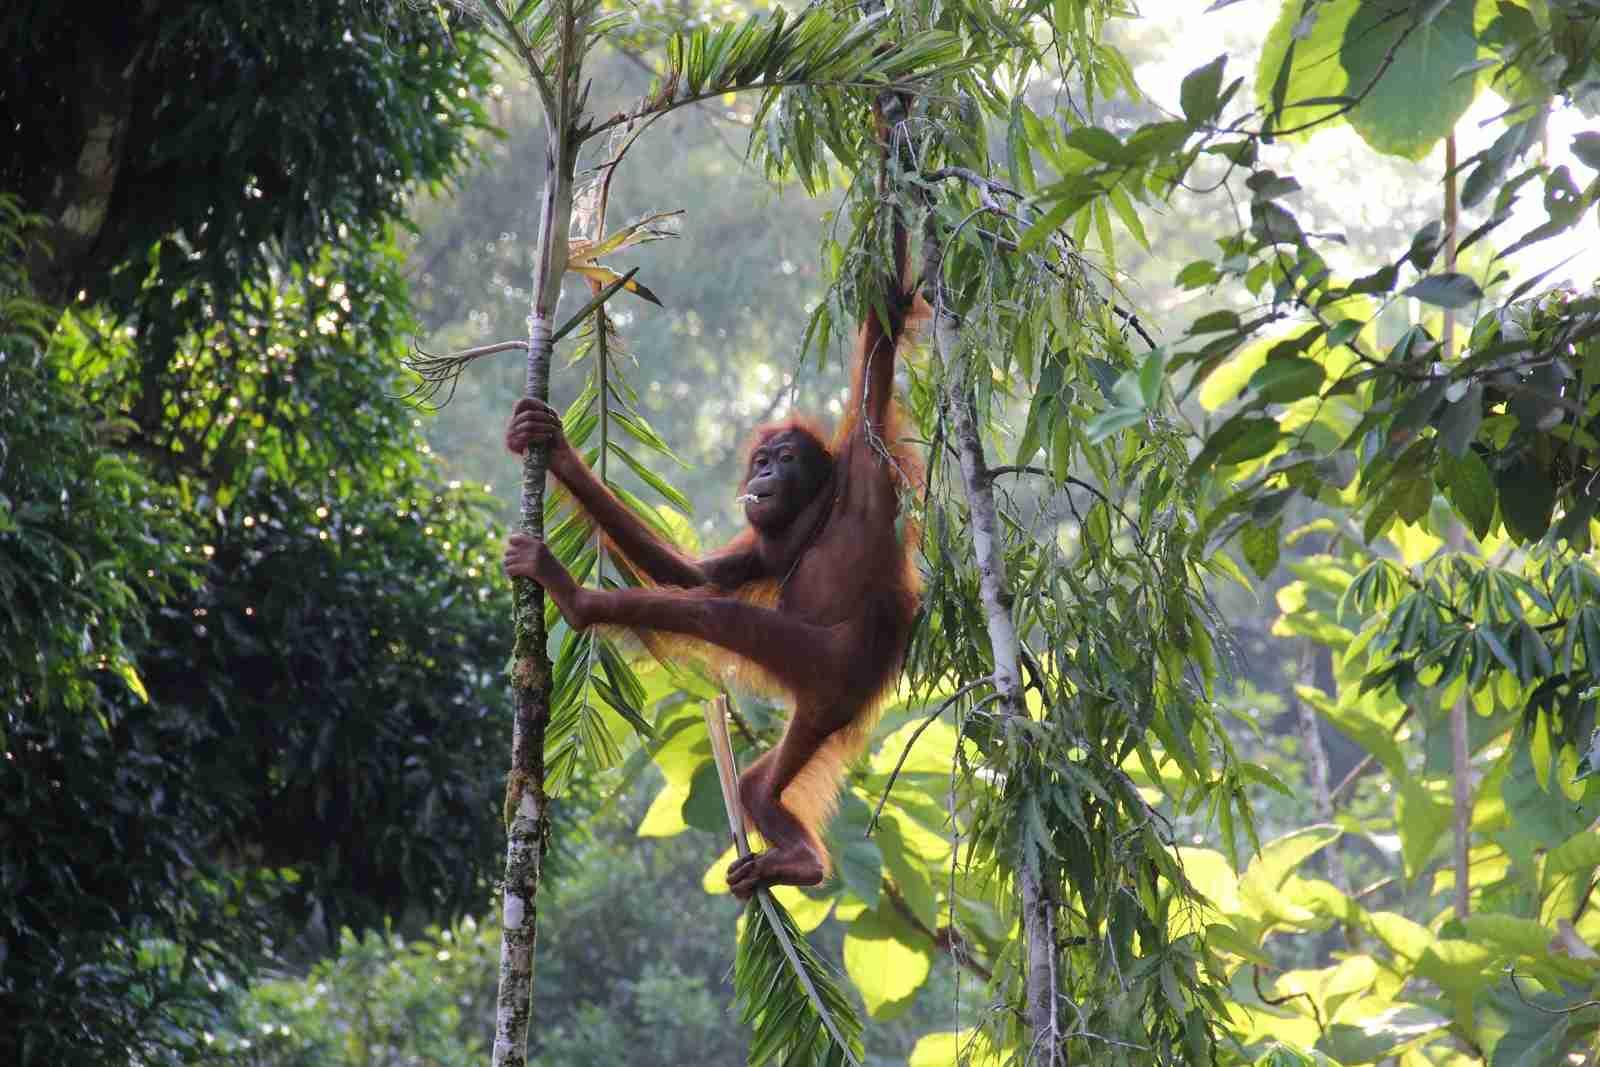 Orangutan in the Borneo rainforest. (Photo by Fish Ho Hong Yun / Shutterstock)